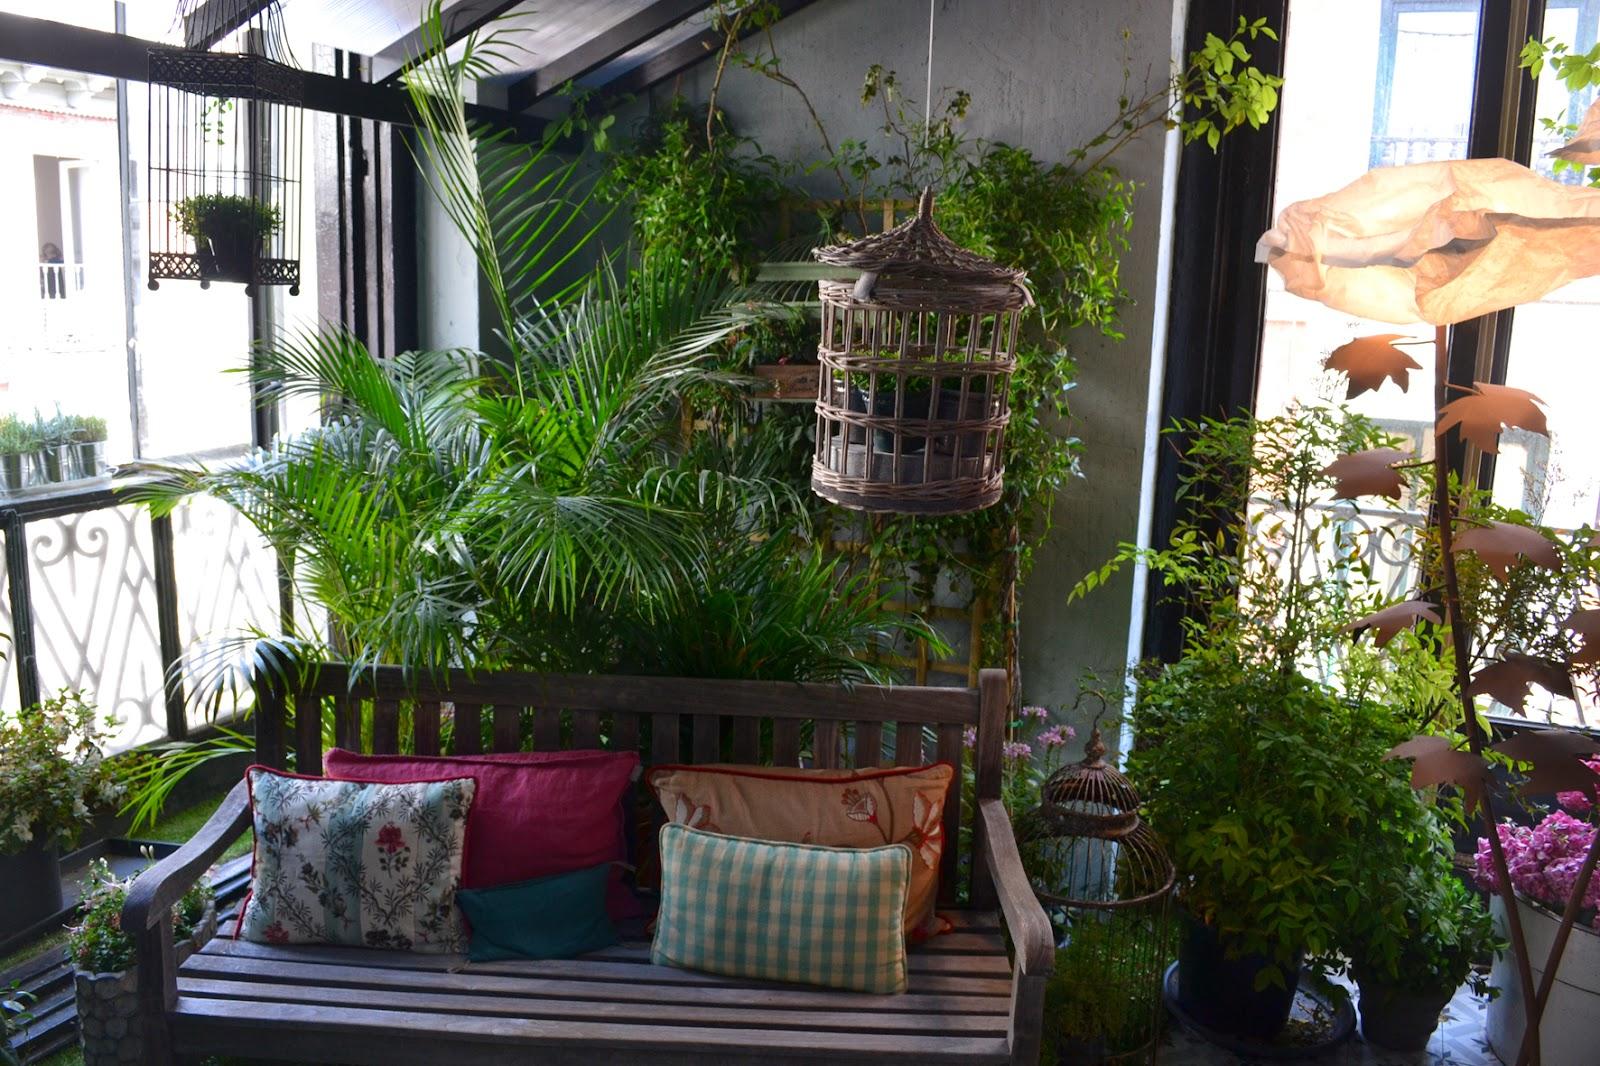 Casa decor madrid 2014 por ilia estudio blog - Estudios de interiorismo madrid ...